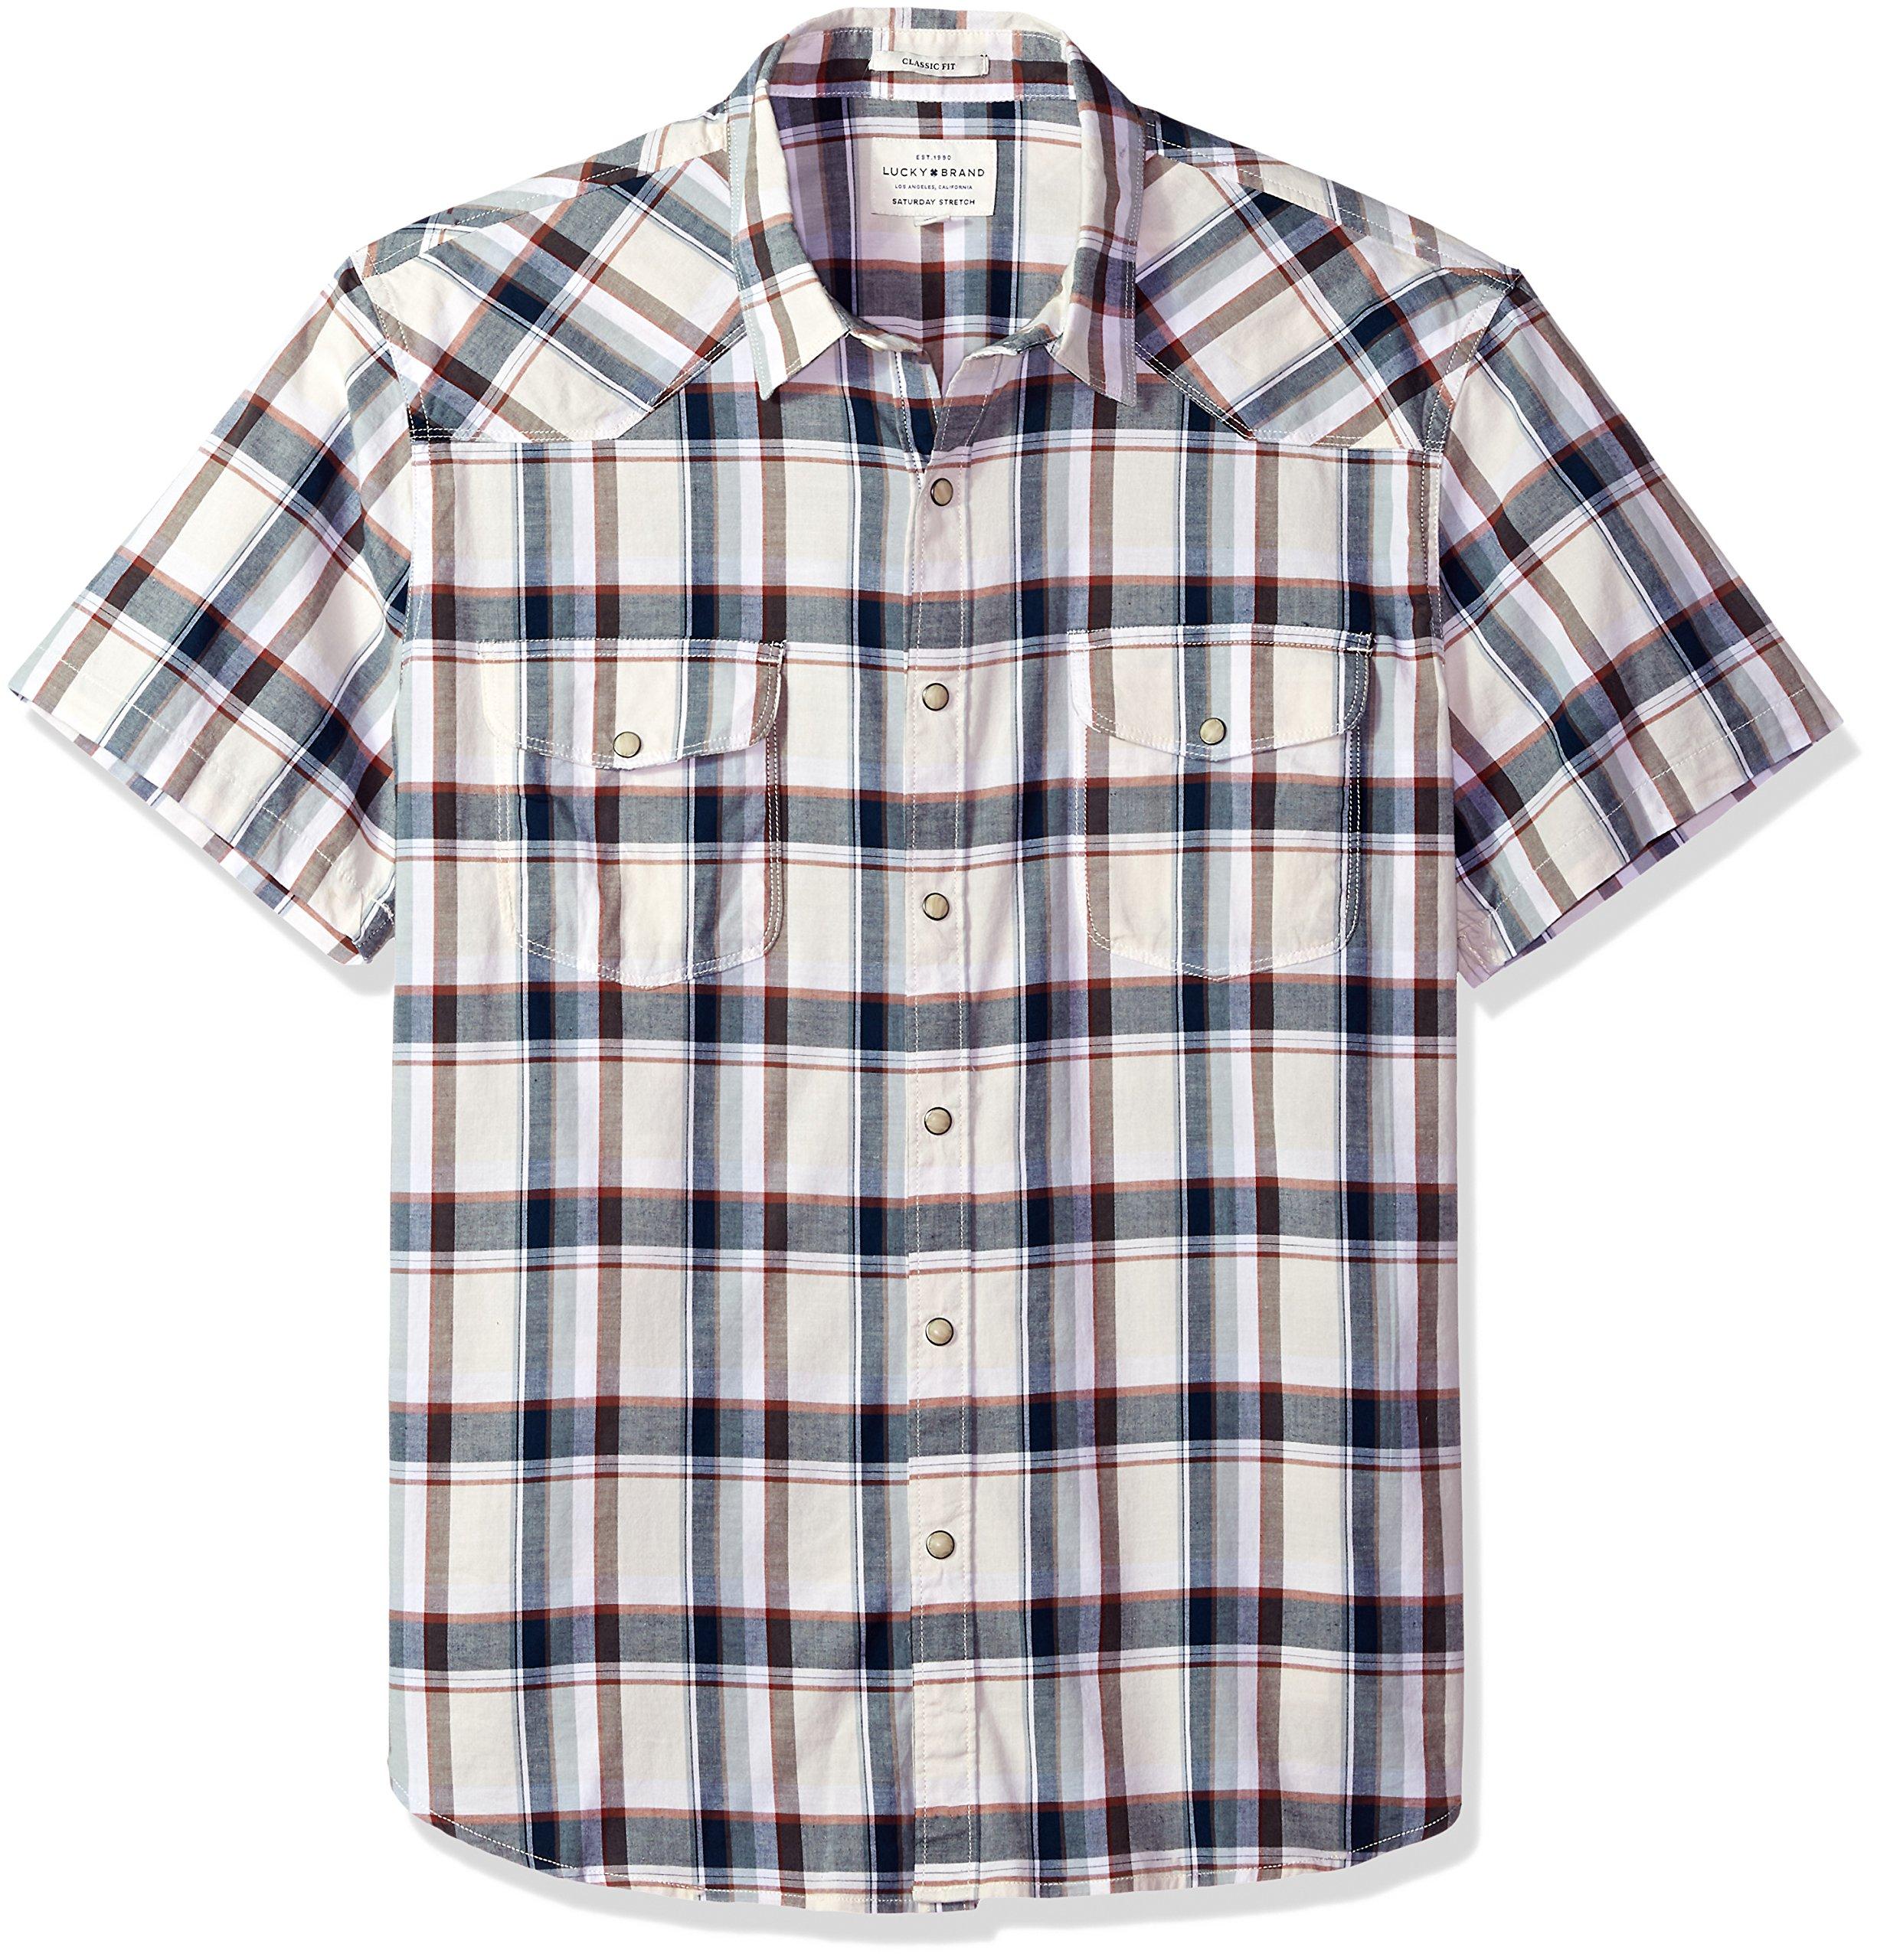 Lucky Brand Men's Casual Short Sleeve Plaid Western Button Down Shirt, Natural Plaid, L